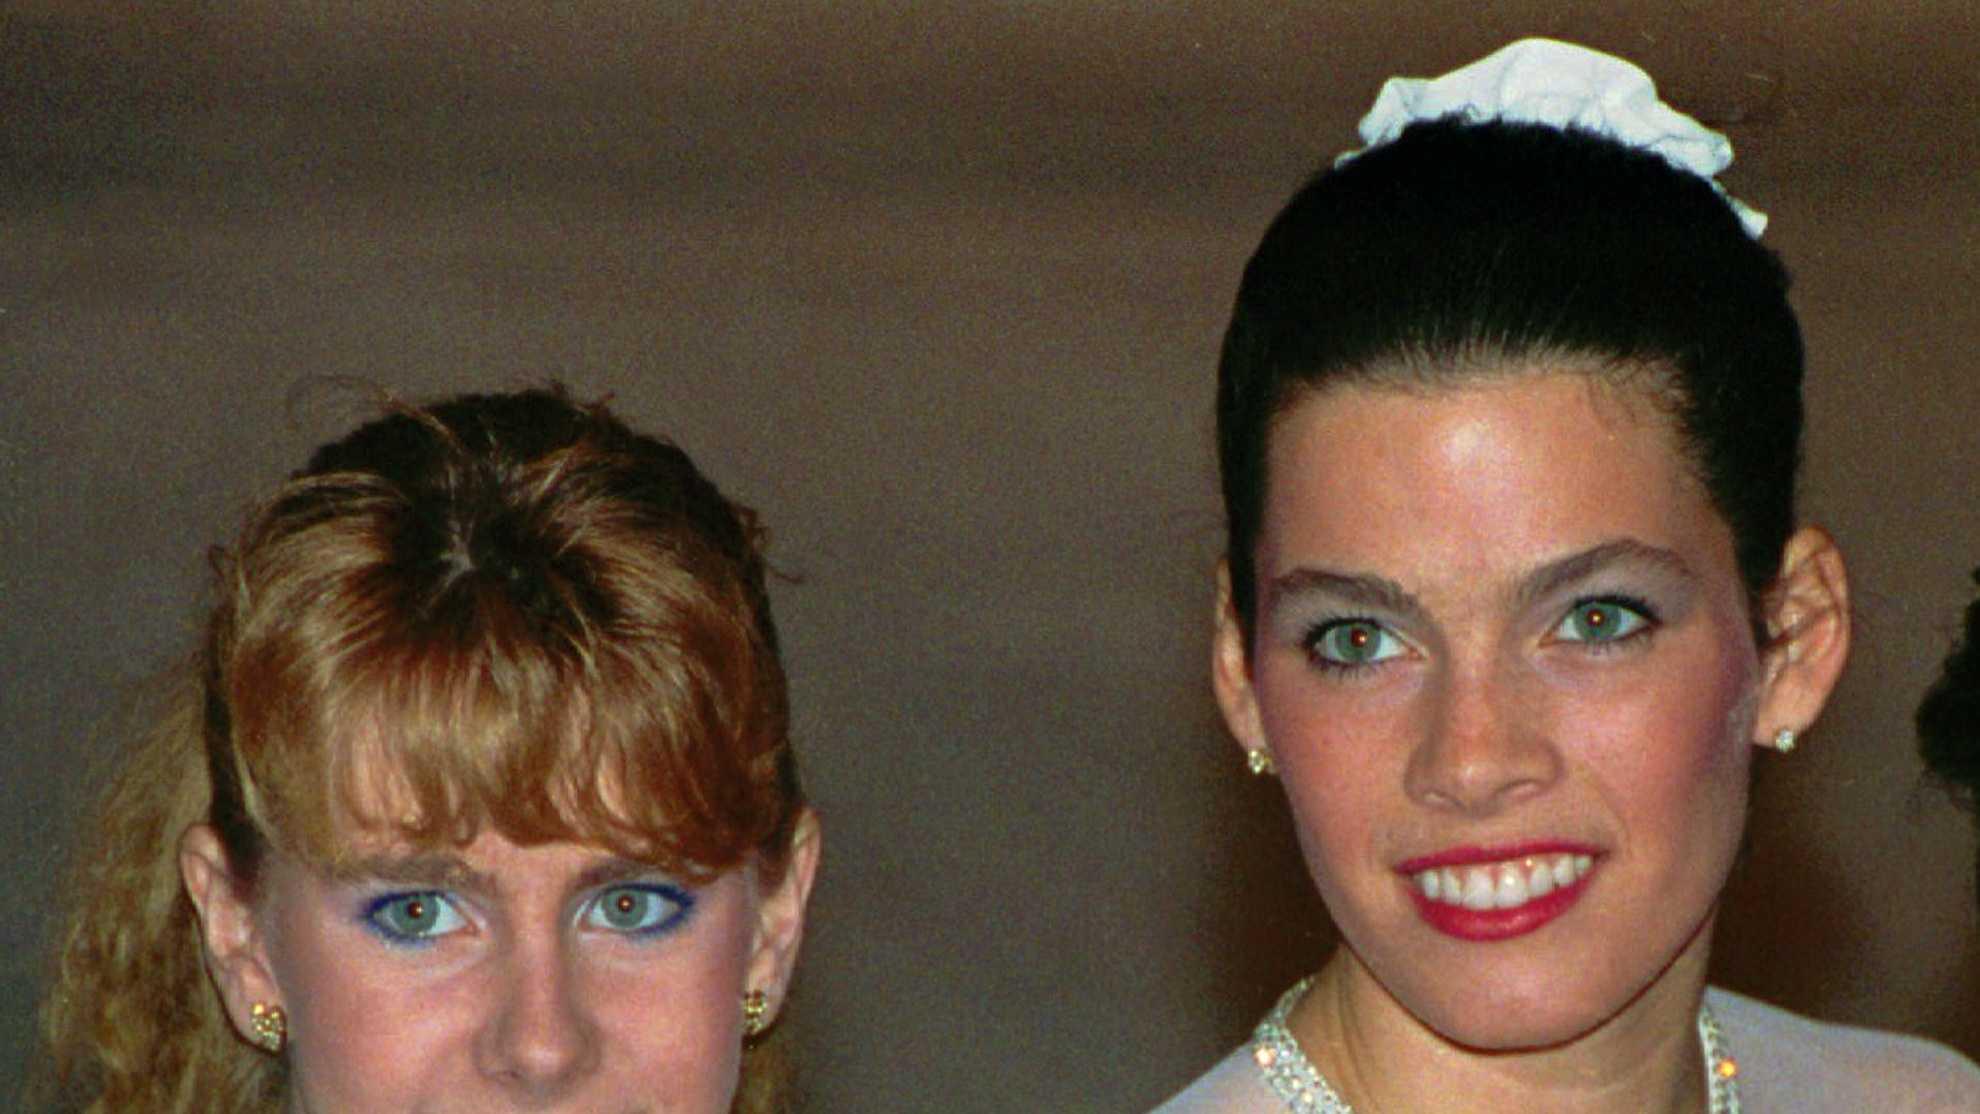 It's been 20 years since a scandal involving Olympians Tonya Harding and Nancy Kerrigan rocked the skating world.